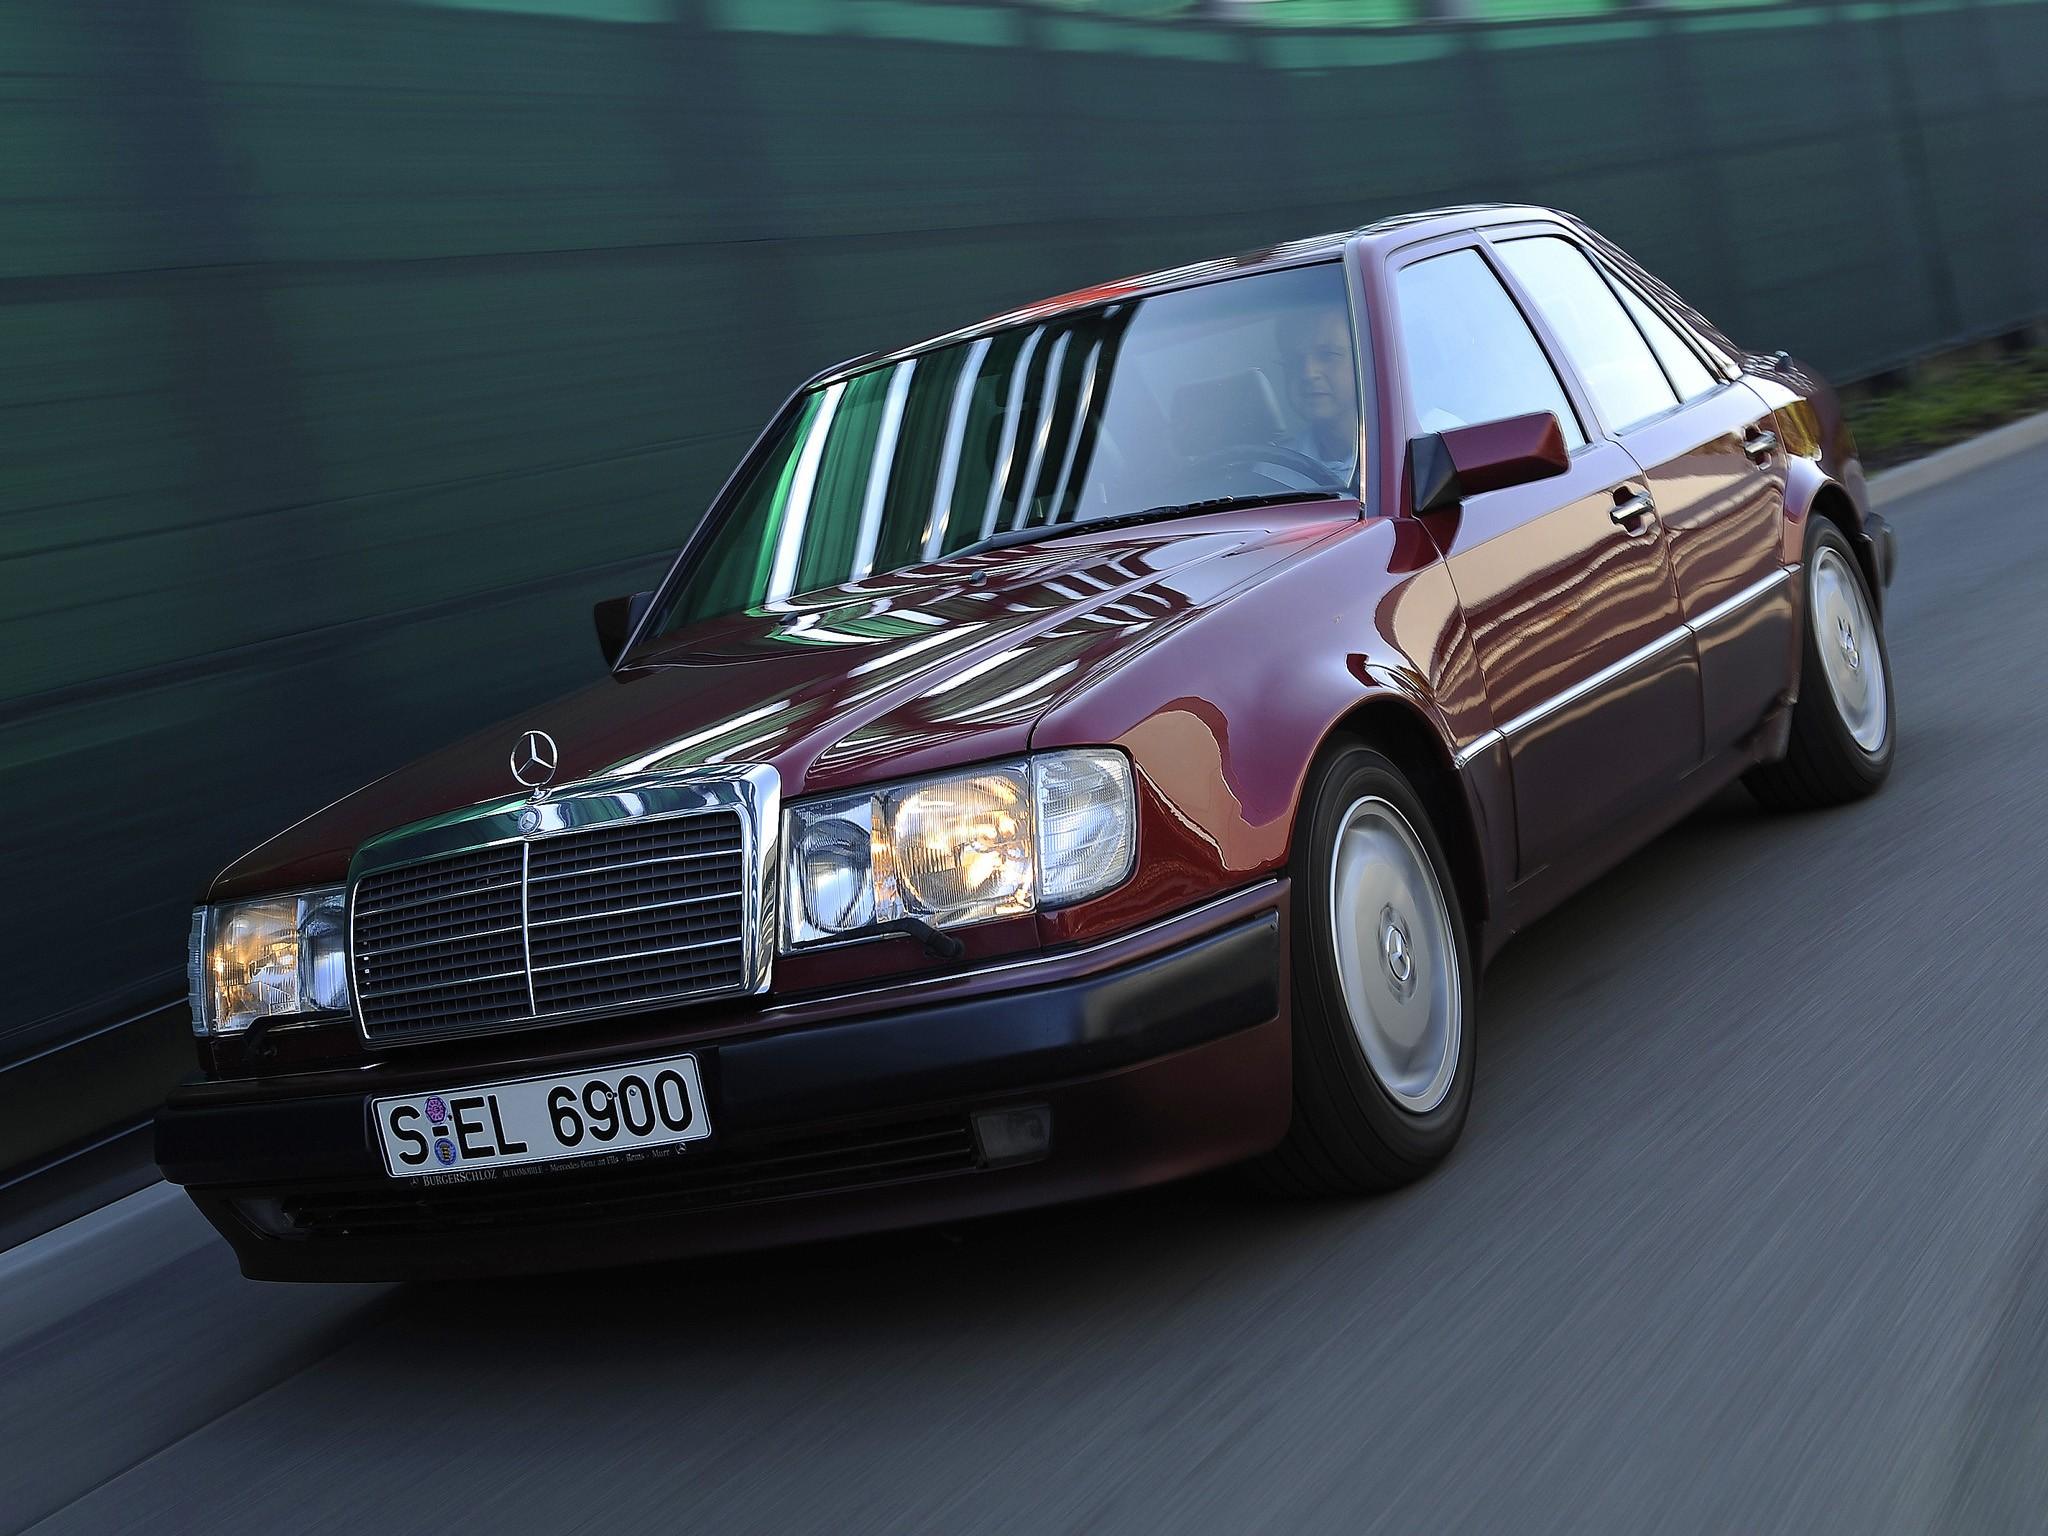 Mercedes benz 500 e w124 specs 1991 1992 1993 for Mercedes benz 1992